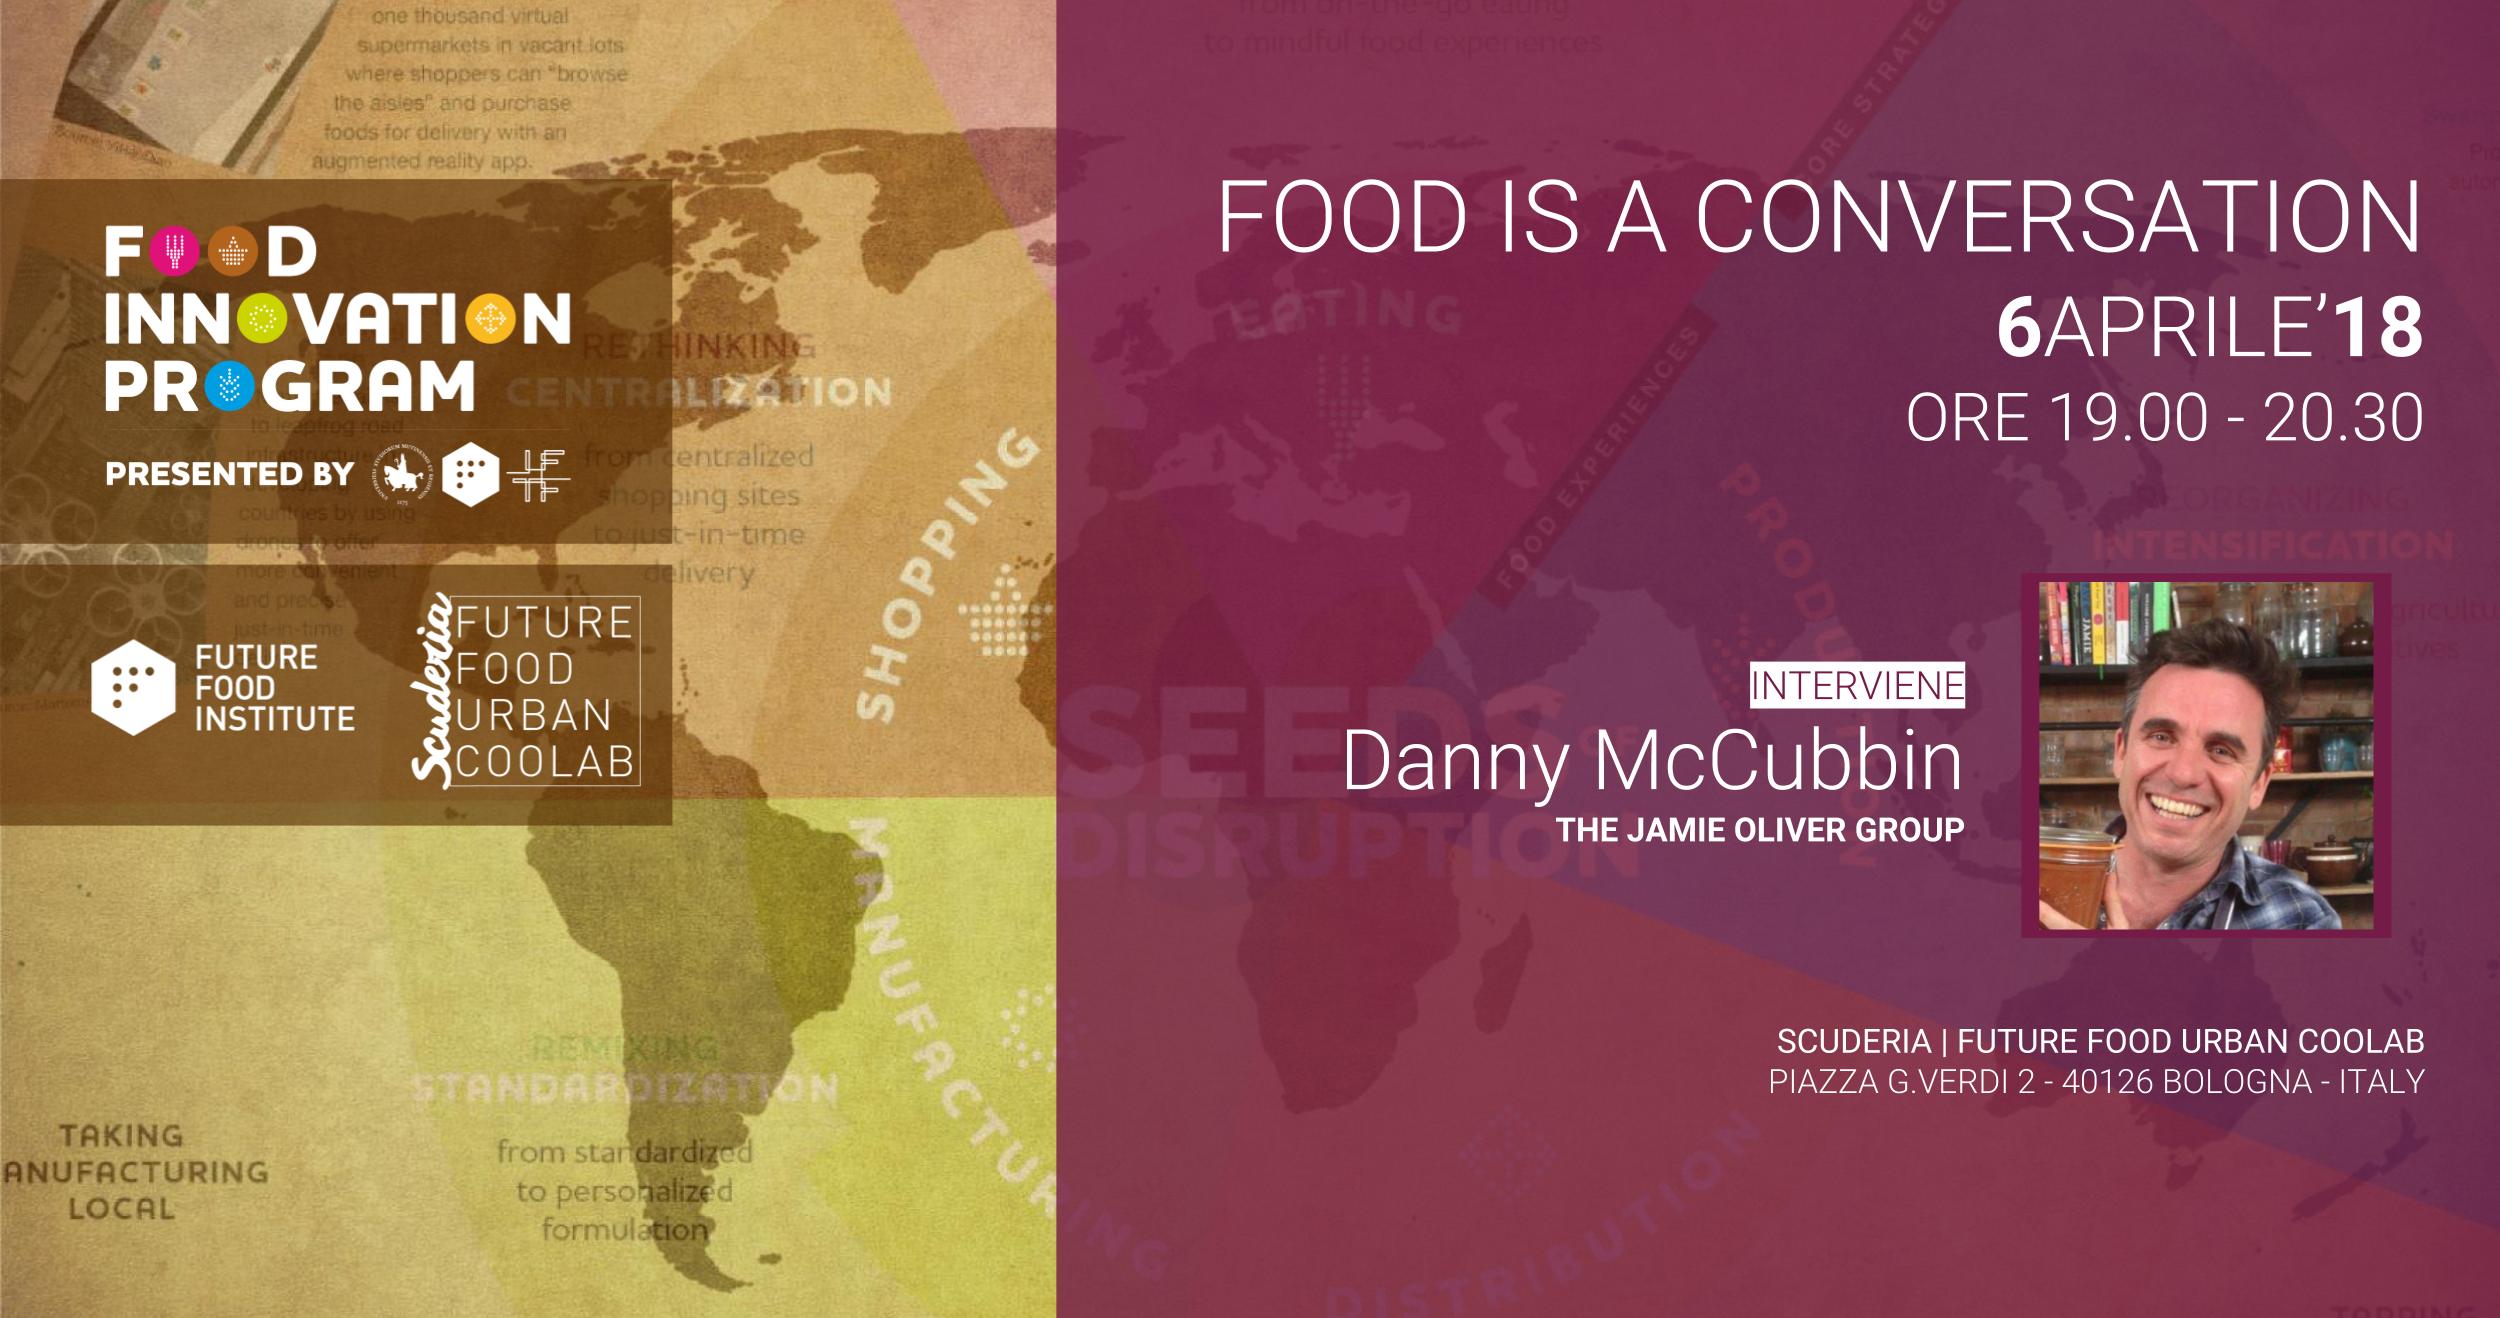 Food is a conversation con Danny McCubbin